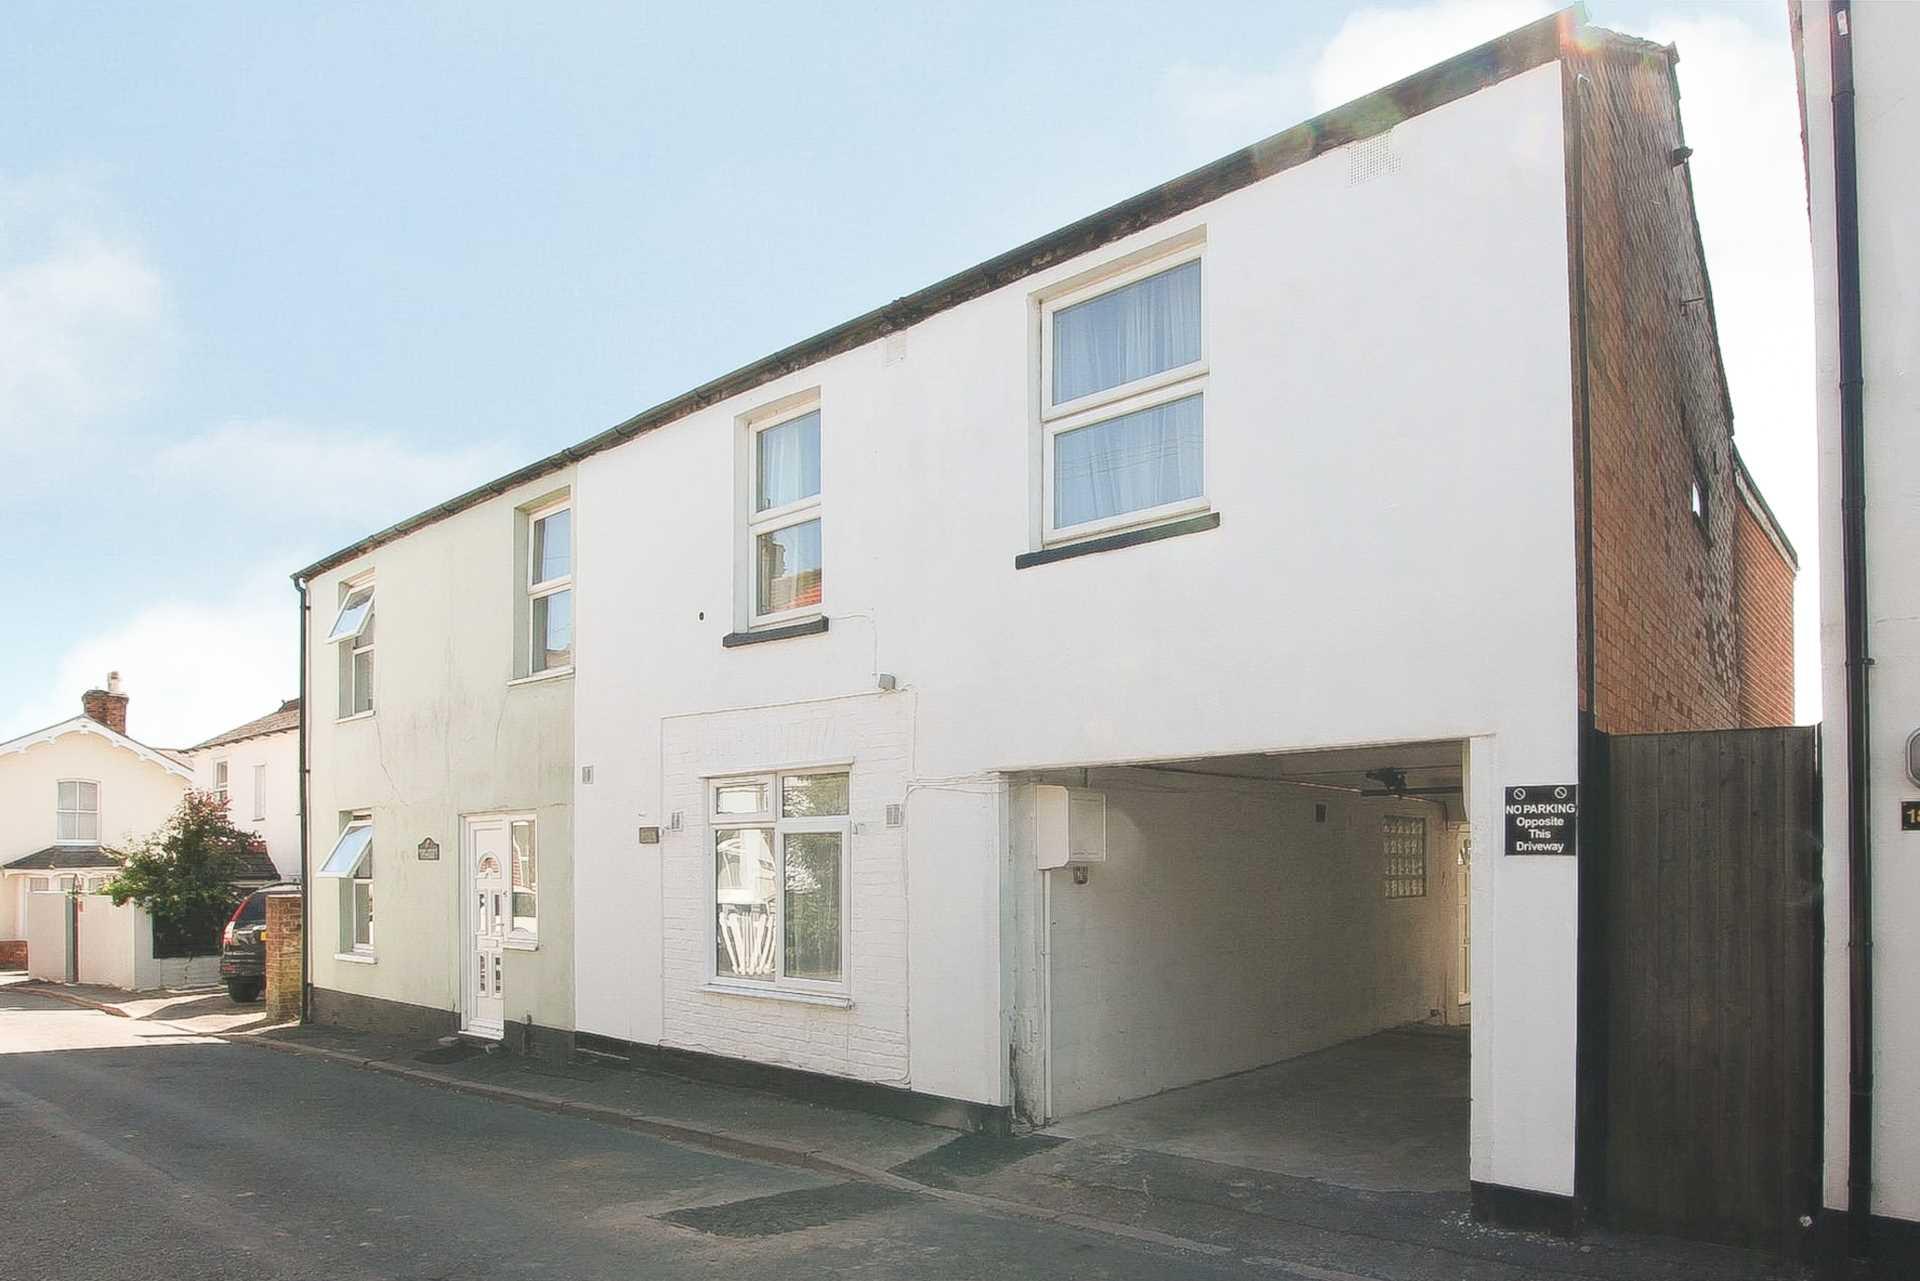 1 bed flat for sale in Albert Street, Blandford Forum, Blandford Forum - Property Image 1